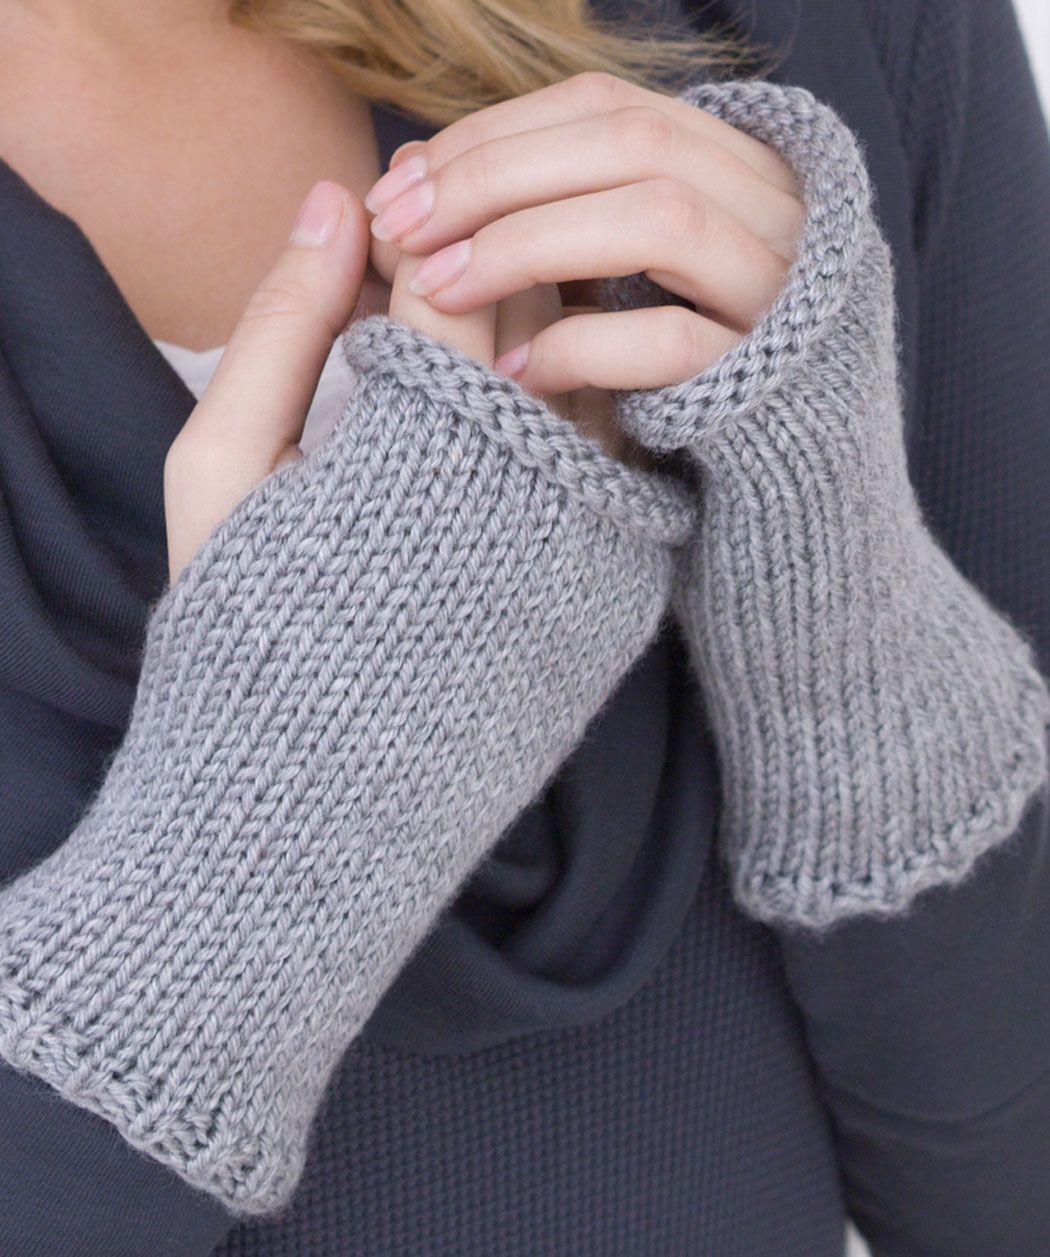 Watch DIY Style: Knitted Snowbird Mittens video